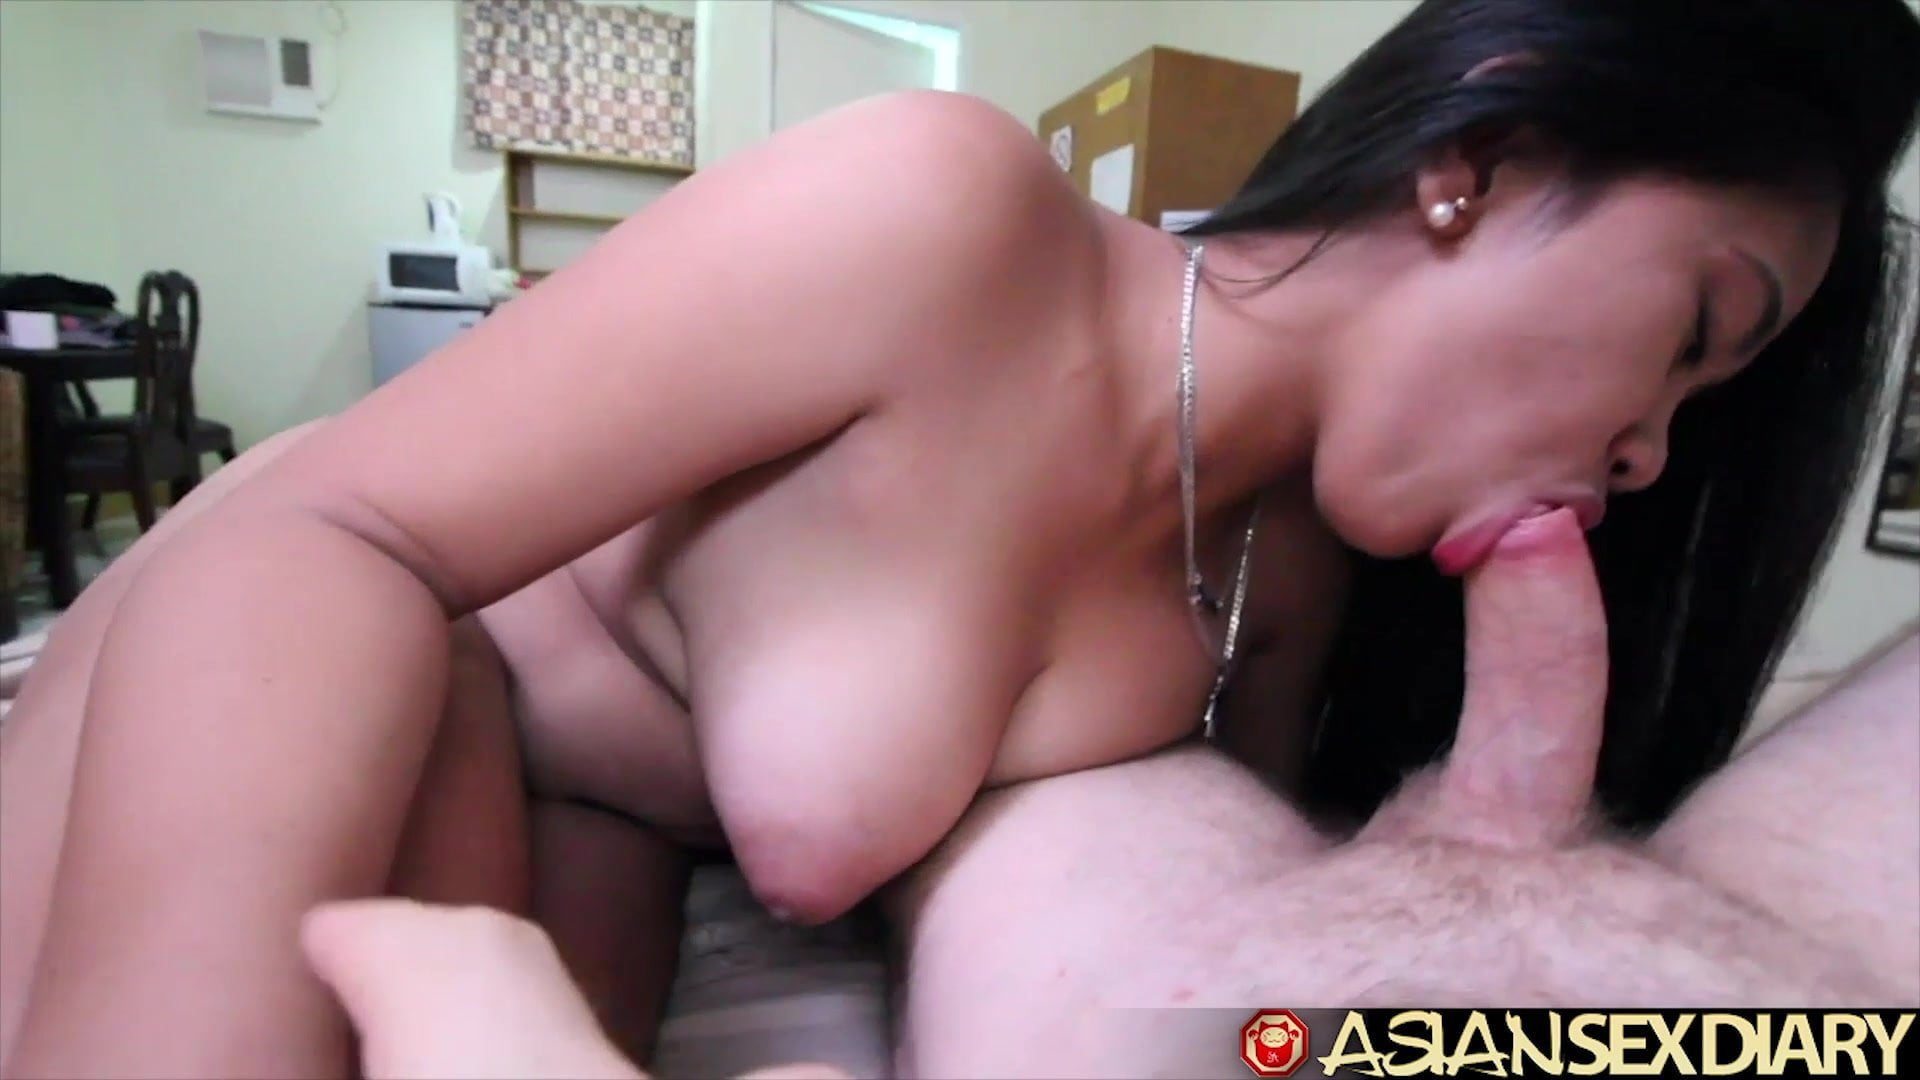 Asian Sex Diary - Beautiful Asian Milf Loves Bwc Porn D9-5316